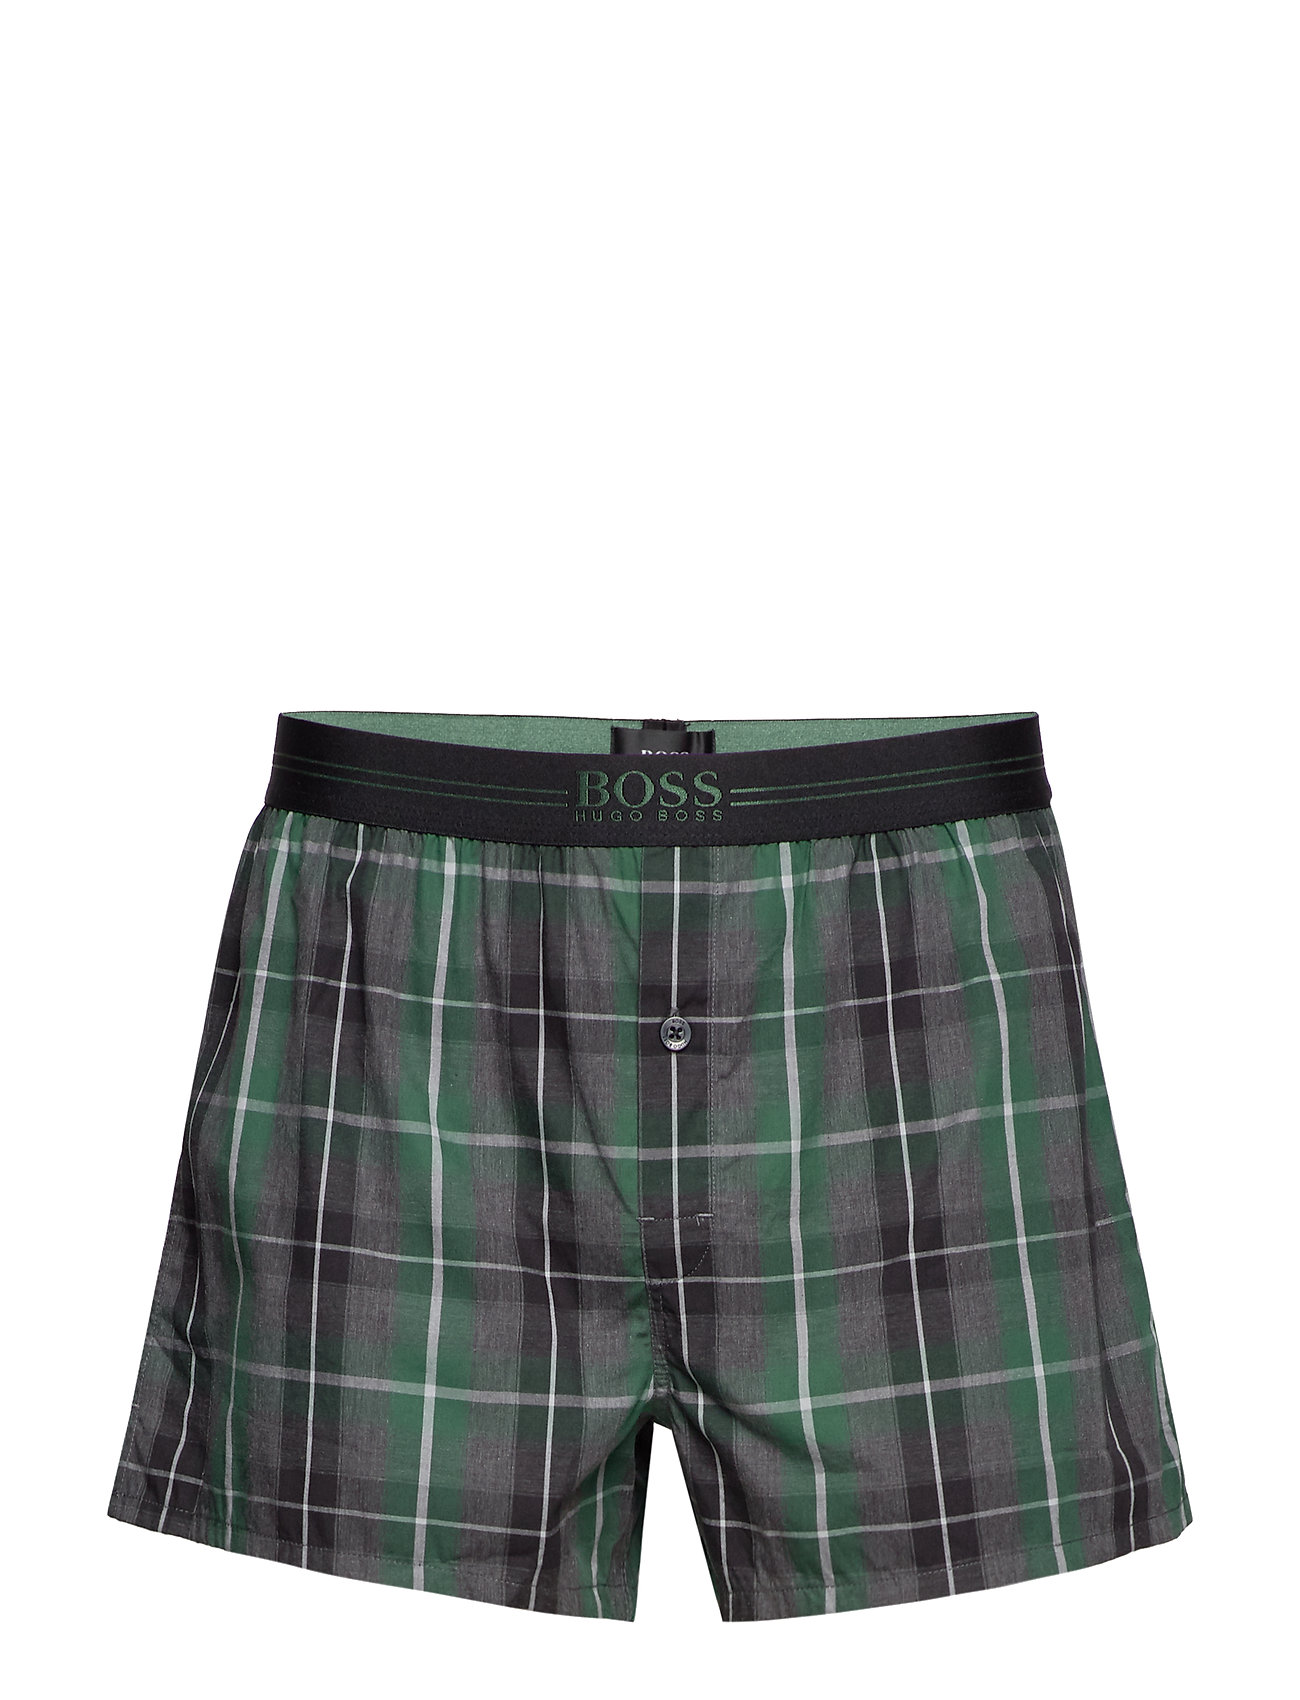 BOSS Business Wear Urban Boxer Short - DARK GREY